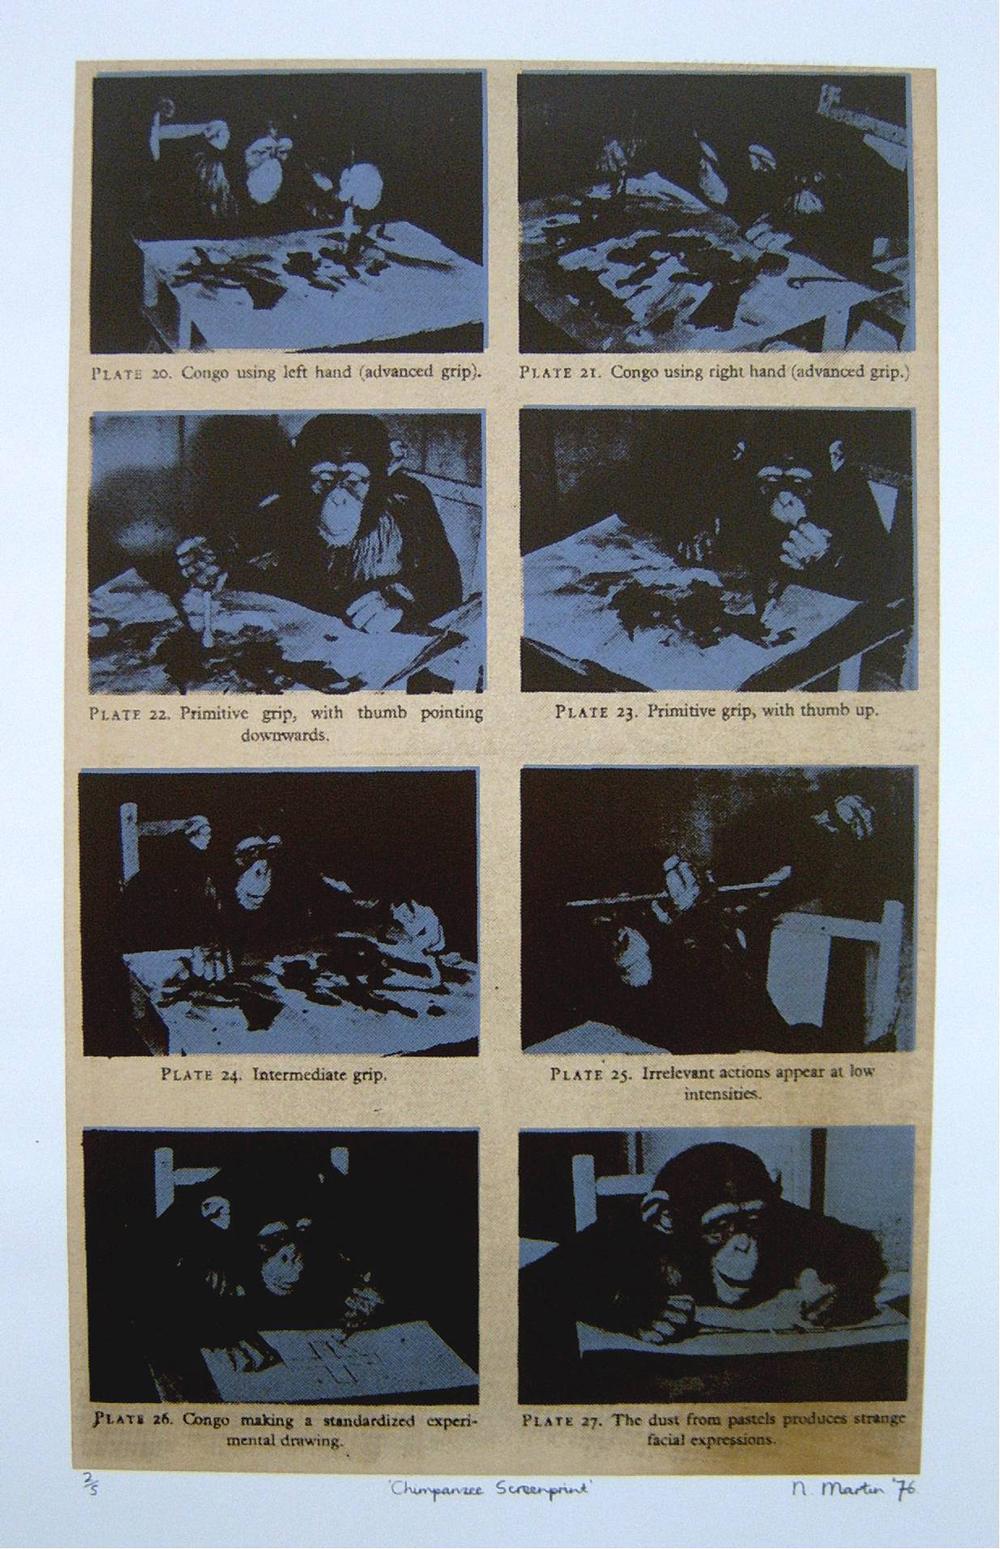 Chimpanzee Screenprint (2/5)